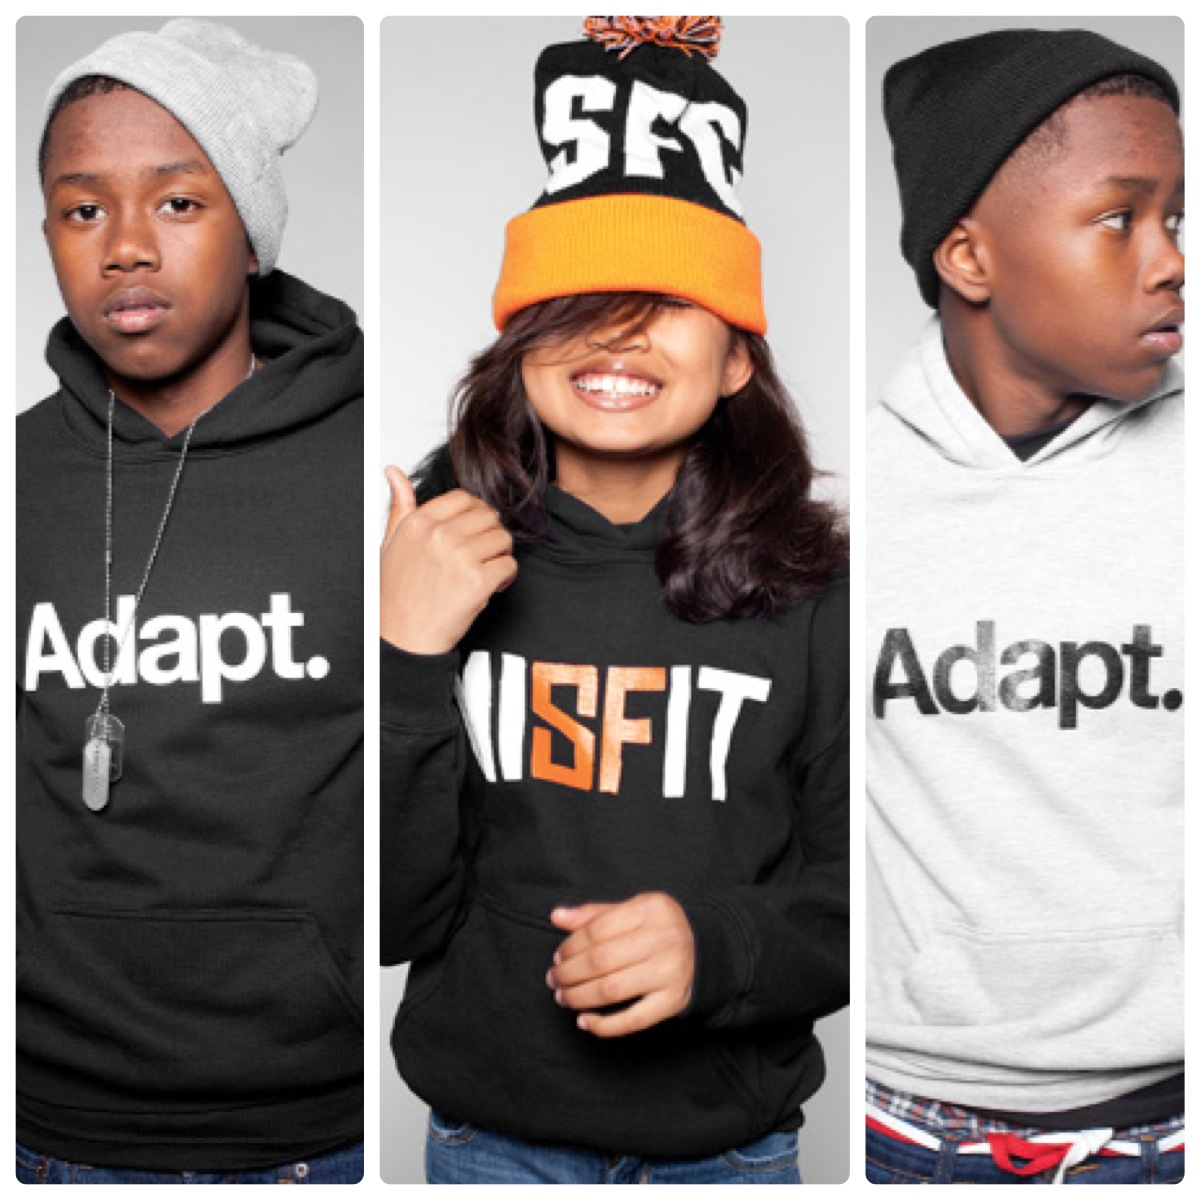 Adapt. Adapt Advancers Clothing. | iRok Fashion